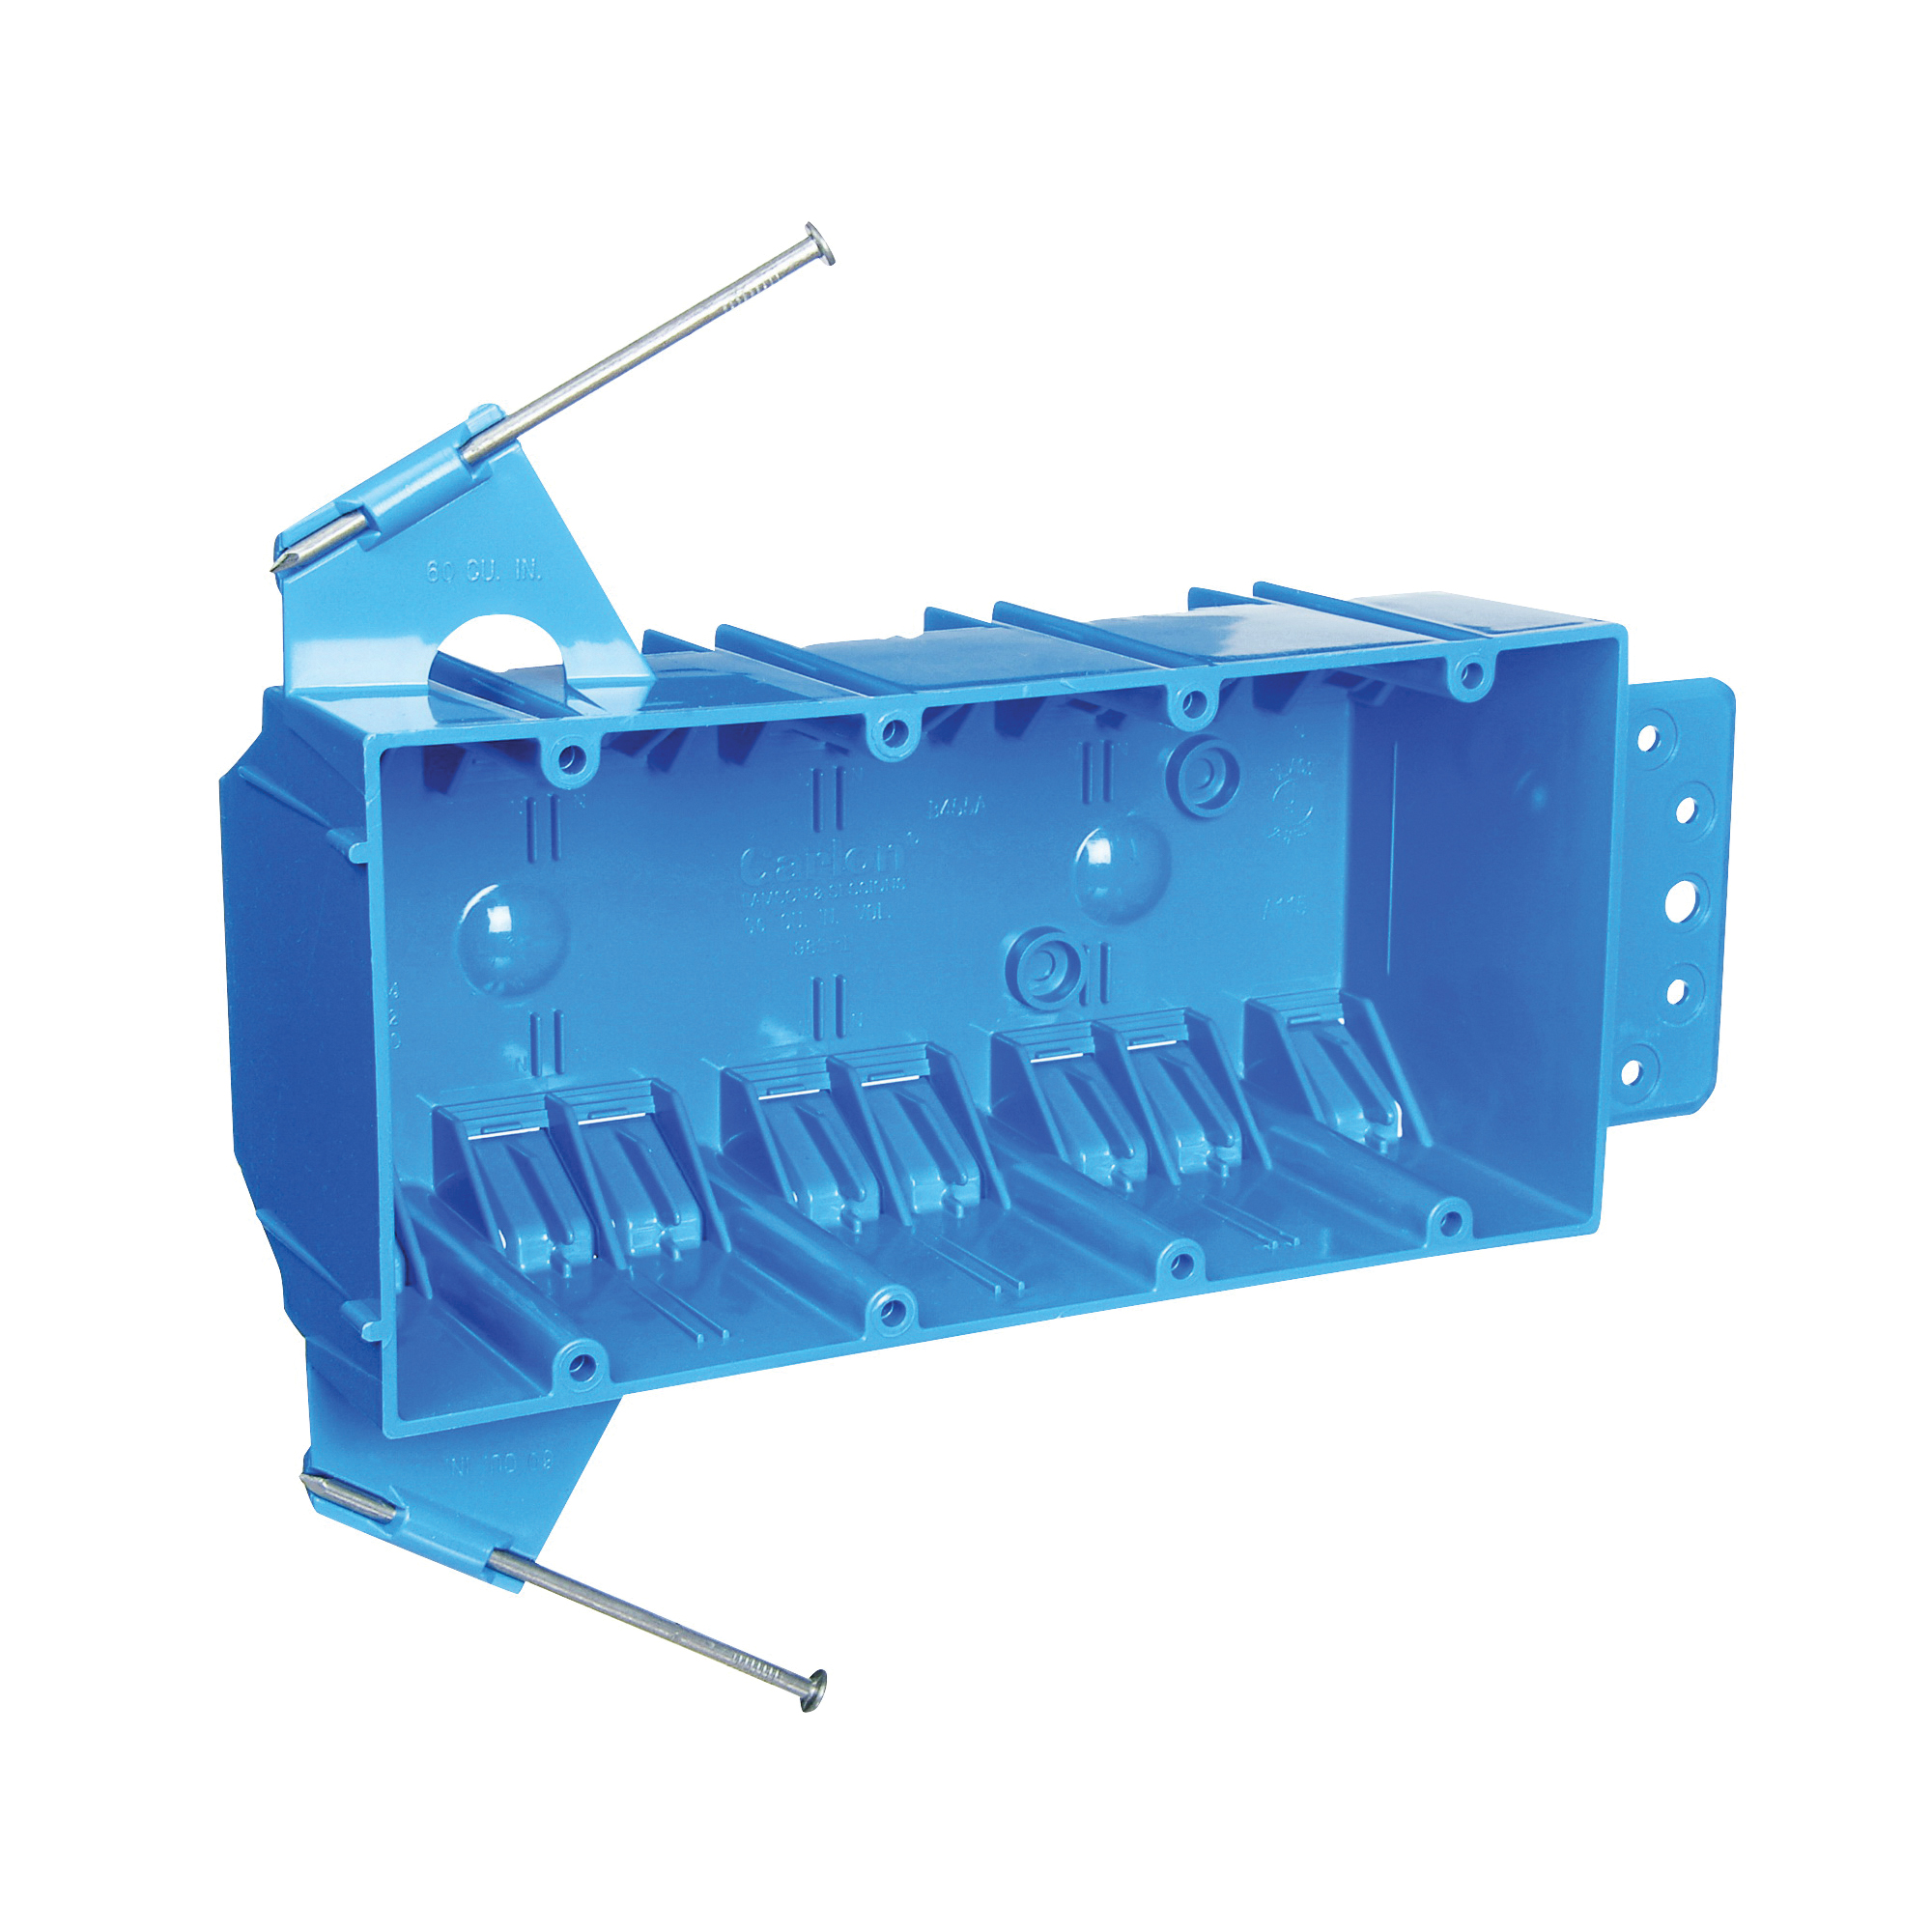 Picture of Carlon B455A-UPC Outlet Box, 4-Gang, PVC, Blue, Bracket Mounting